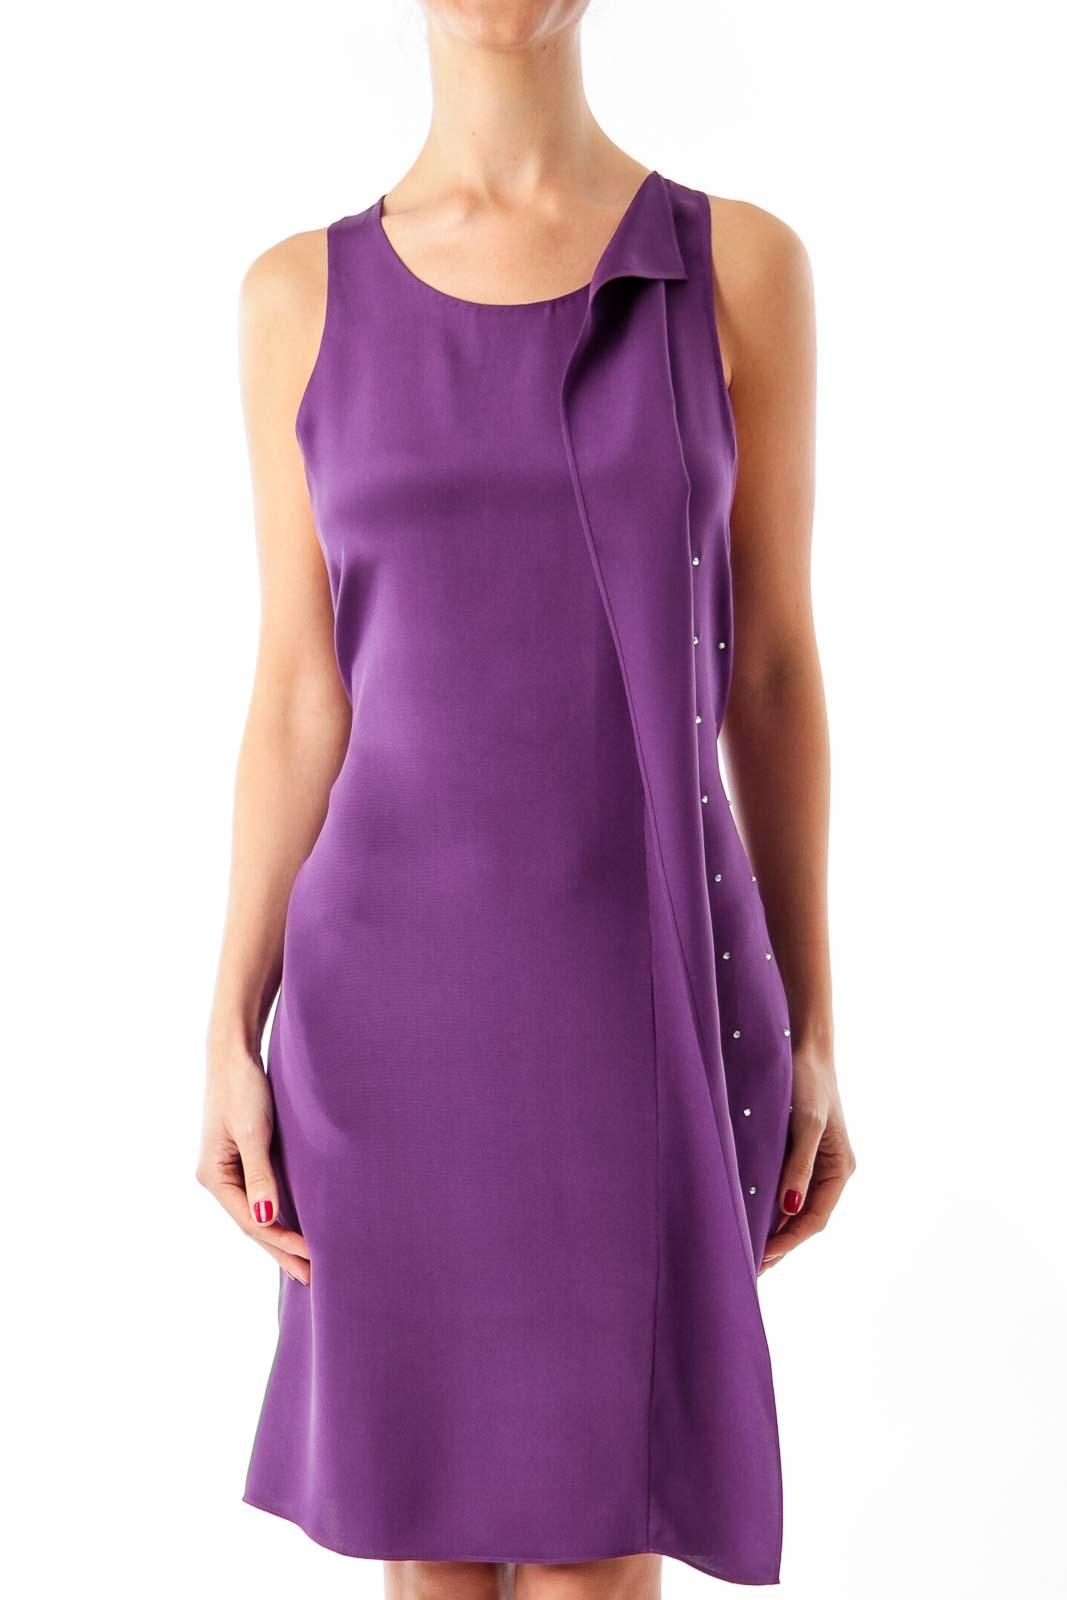 Purple Sequin Sleeveless Dress Front